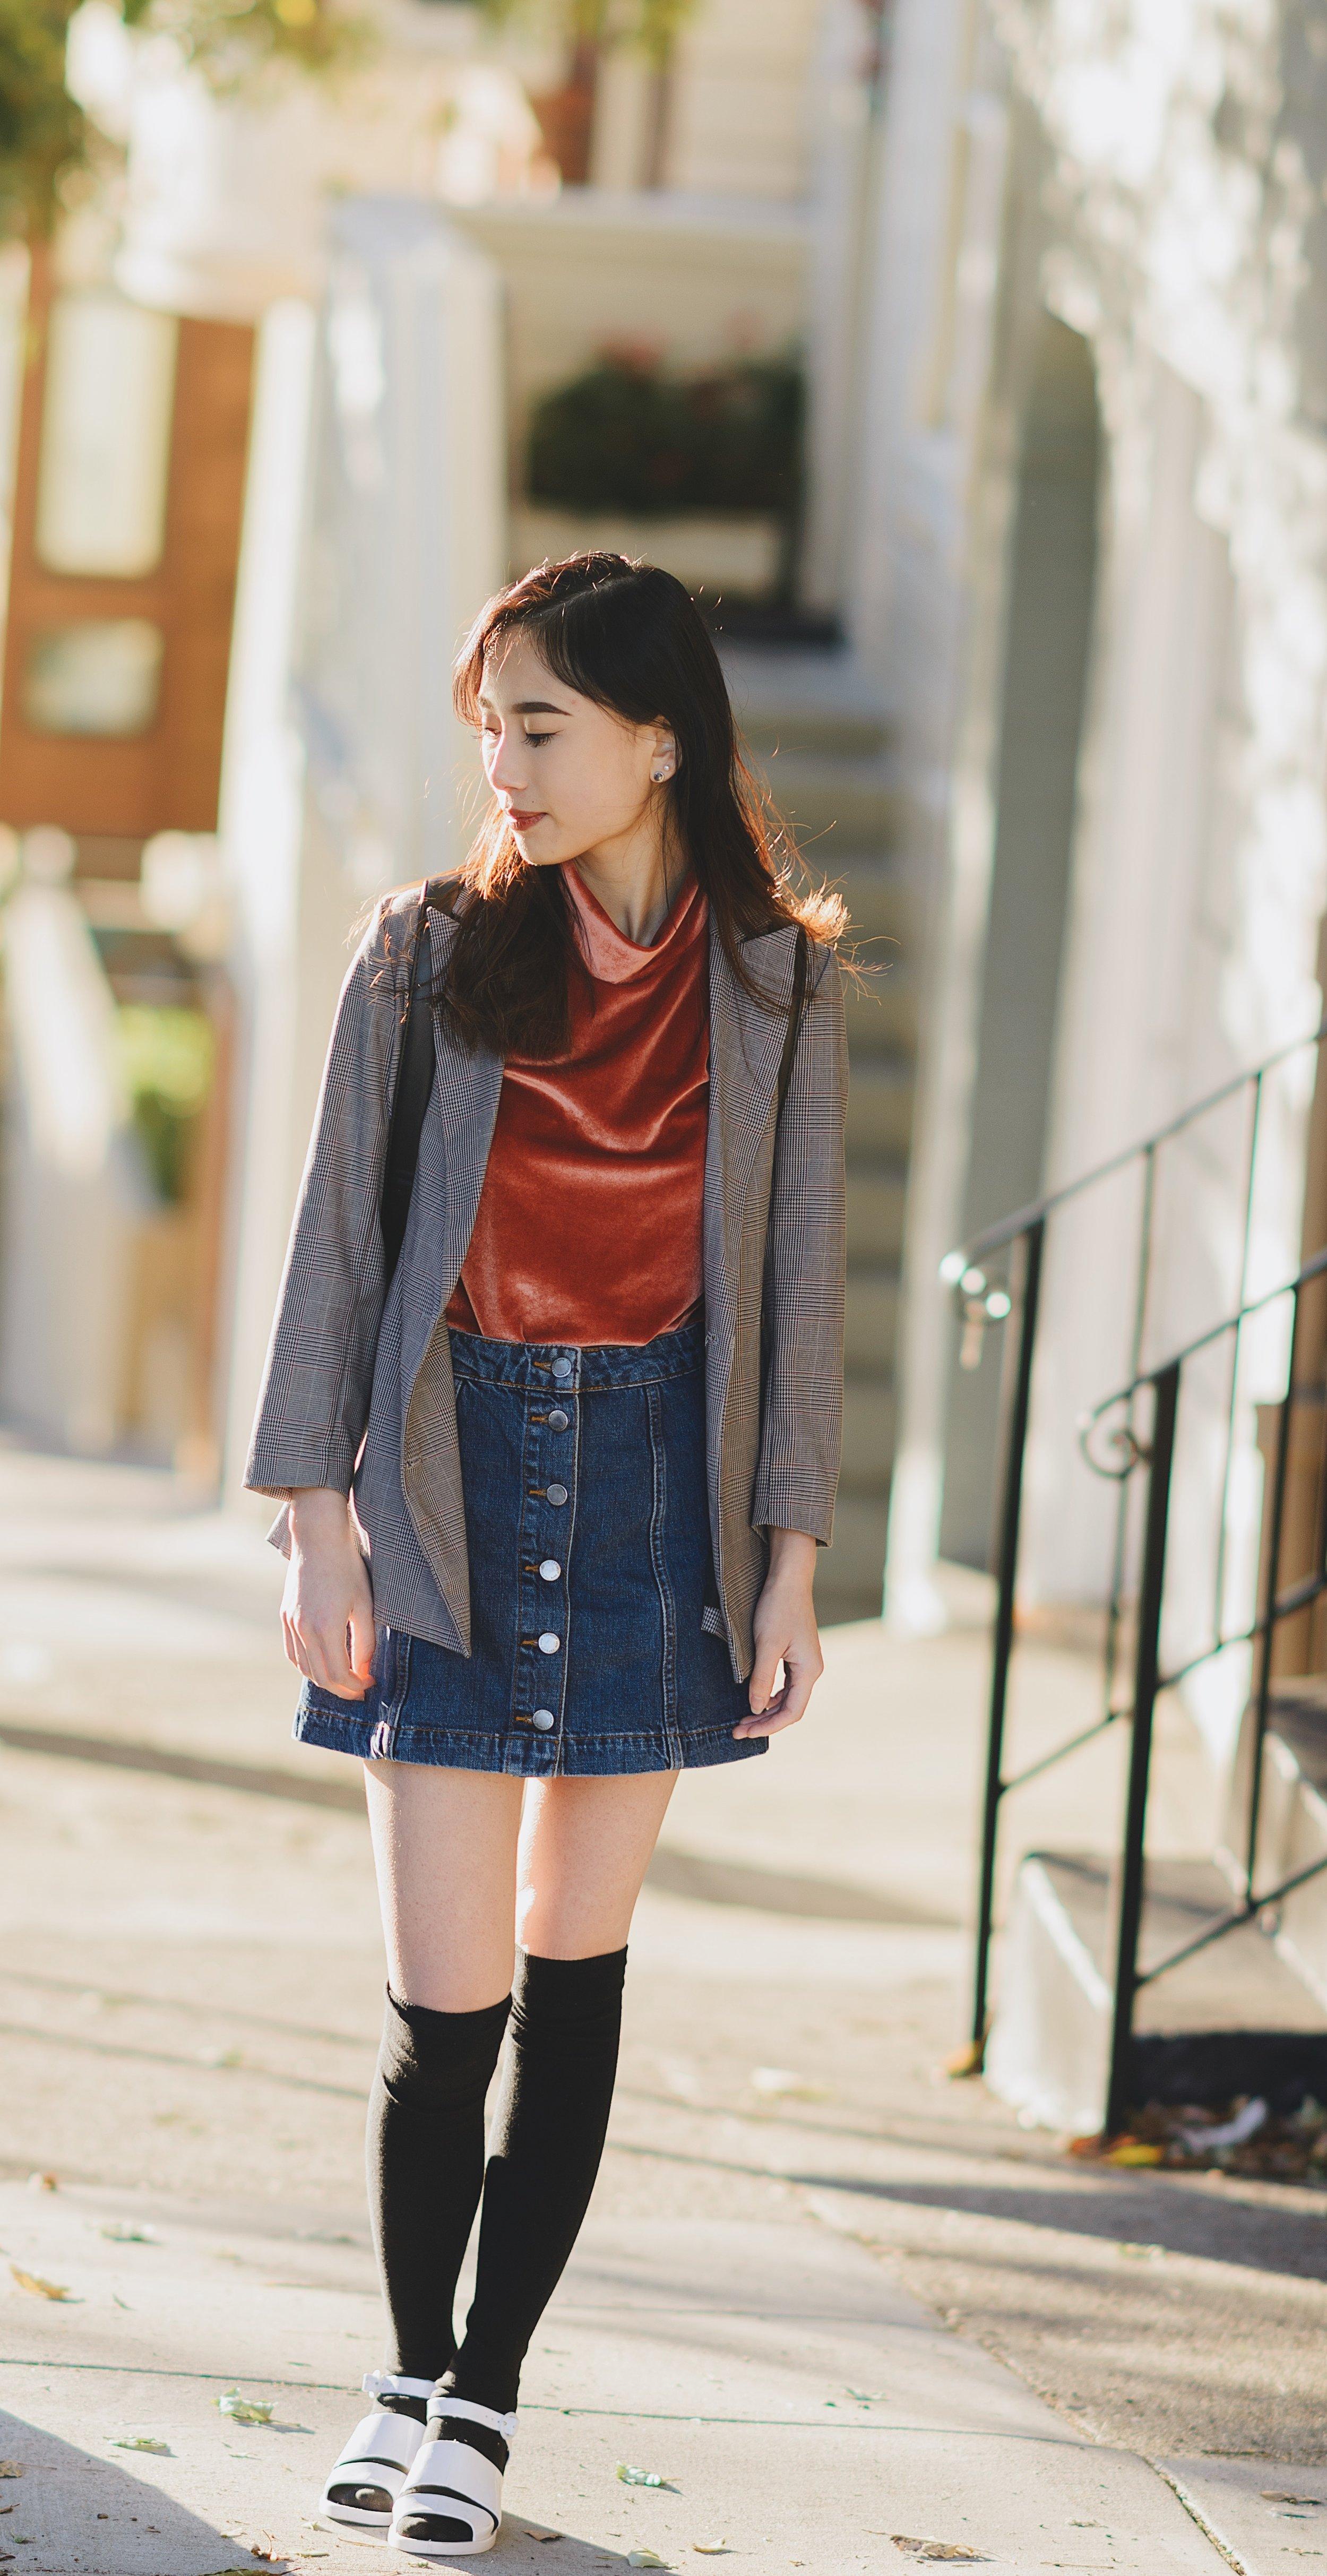 Cinder Block: top - Madewell, Skirt - Topshop, Shoes - American Apparel